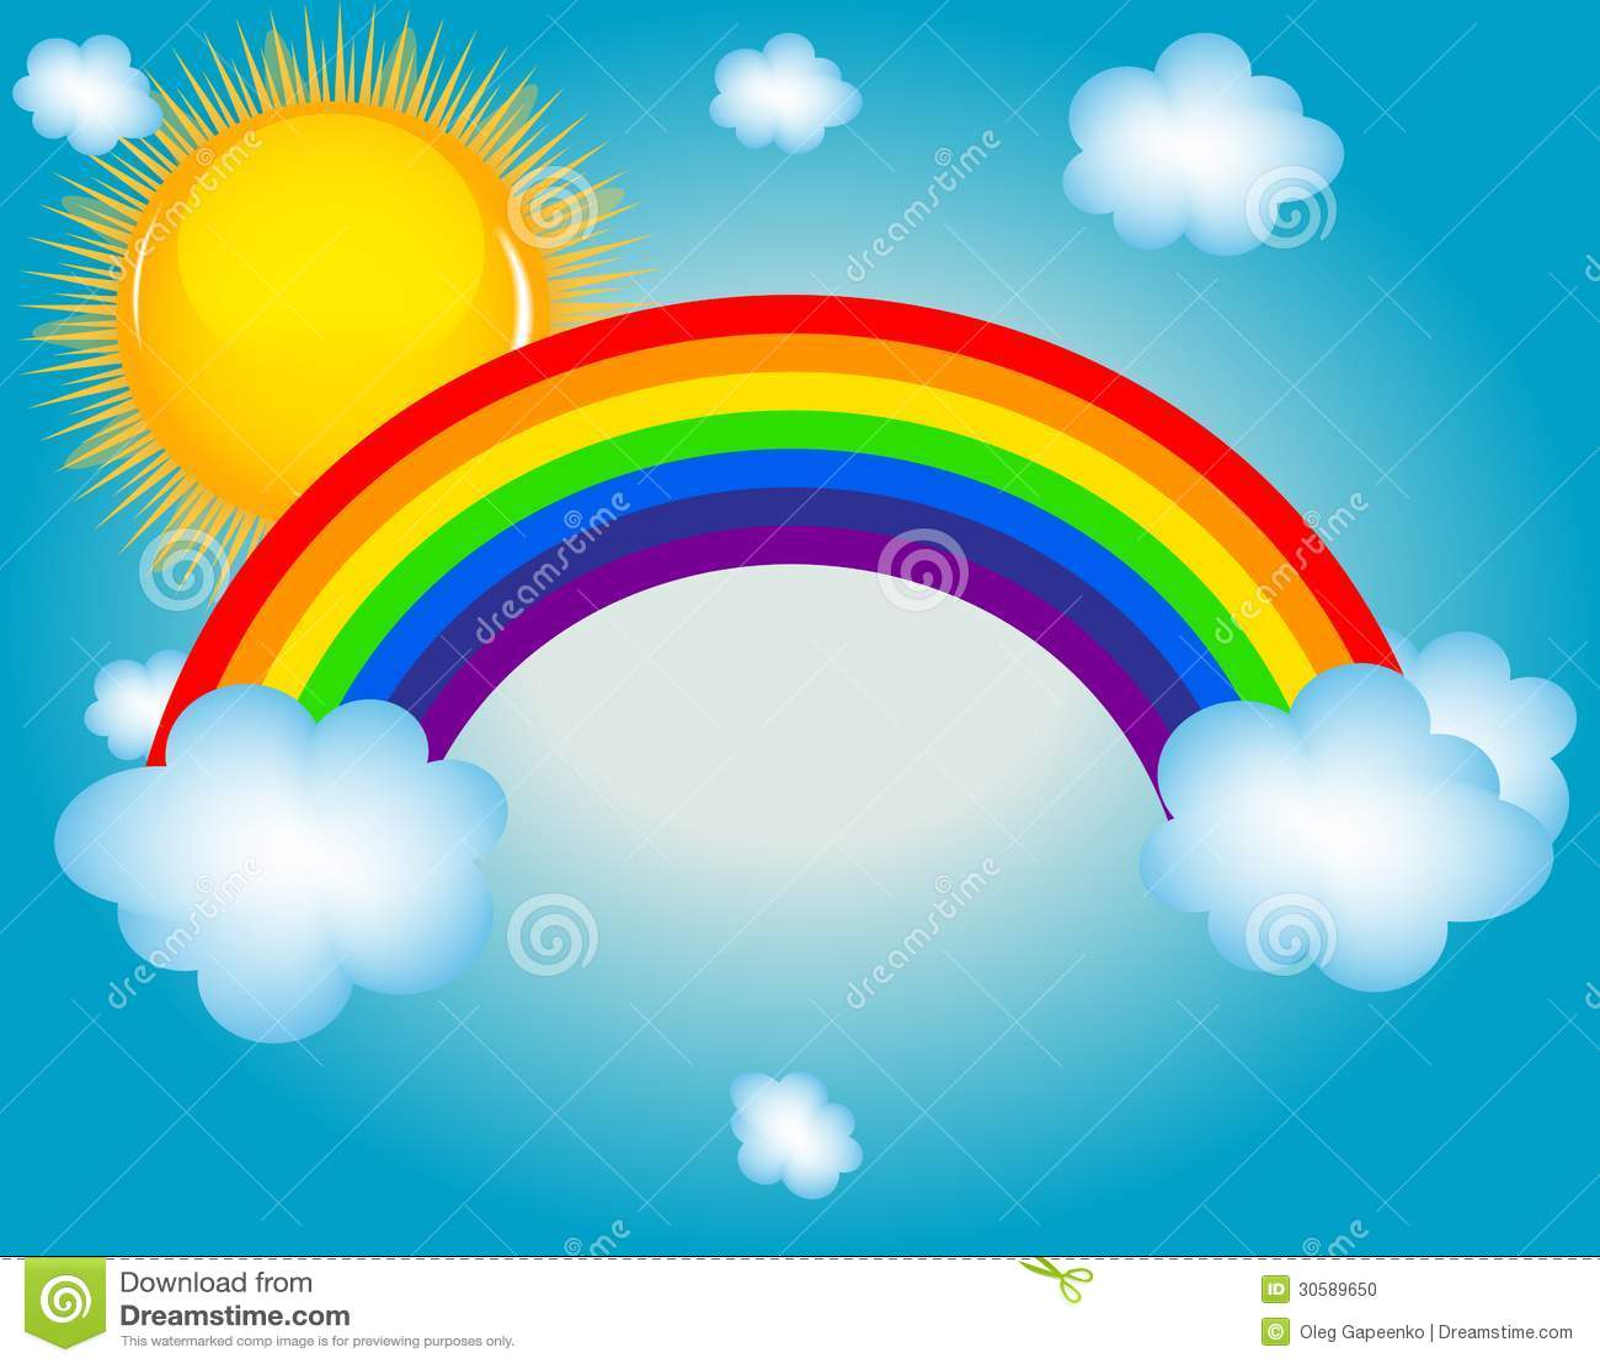 Rainbow Stickers For Walls Cloud Sun Rainbow Vector Illustration Background Stock